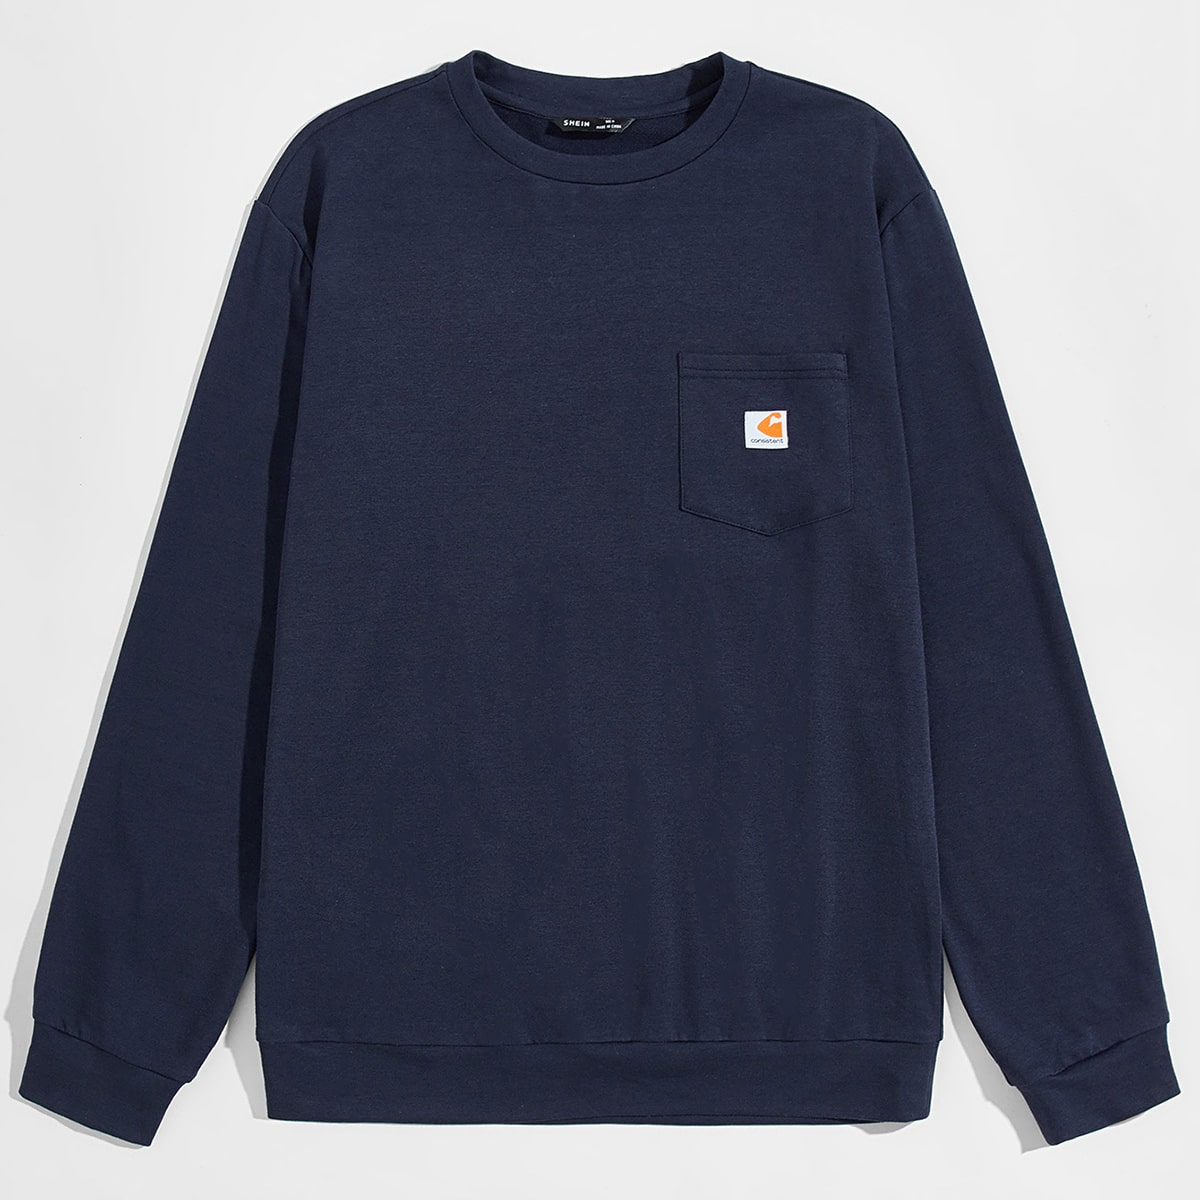 Мужской пуловер с карманом от SHEIN